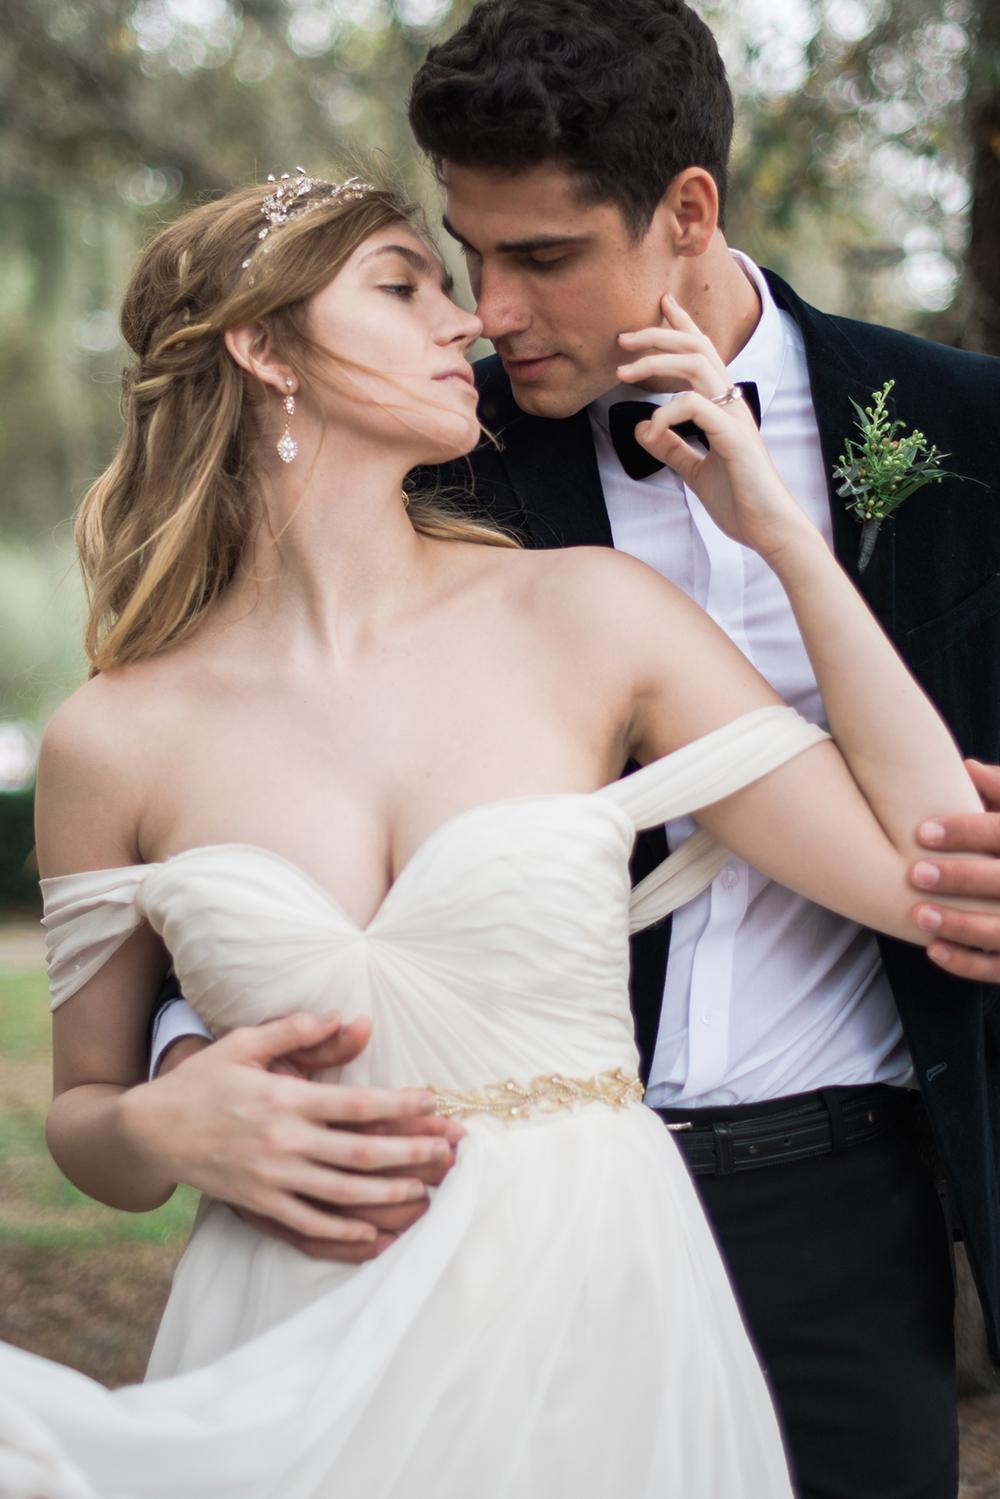 romantic wedding dresses - photo by Kristen Weaver Photography https://ruffledblog.com/modern-organic-wedding-inspiration-with-greenery